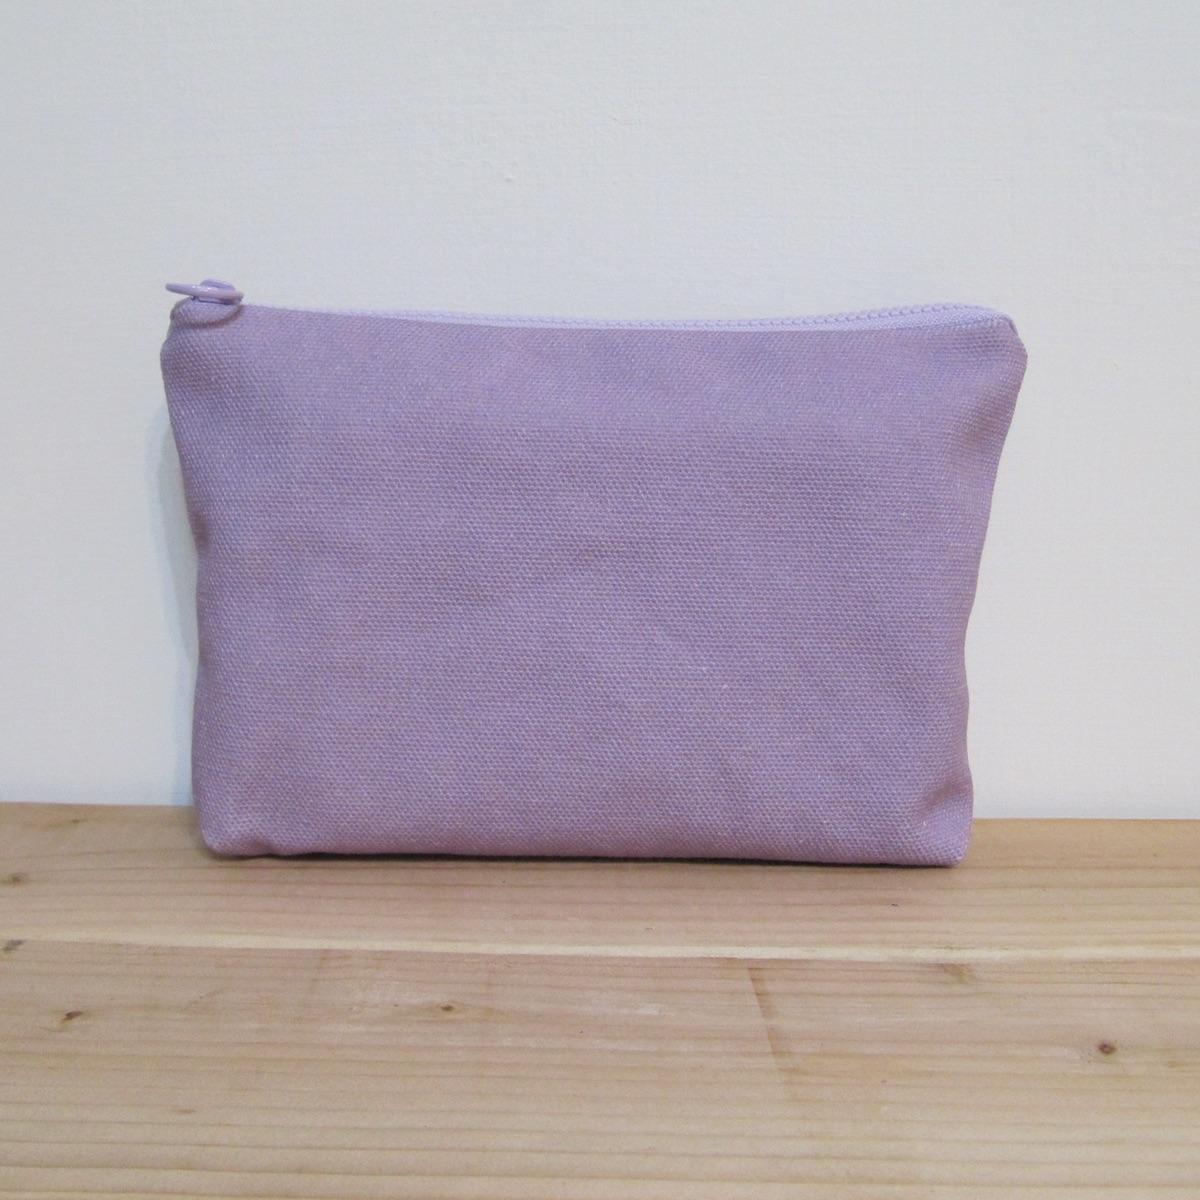 【Lilytata 淺紫色 薰衣草 收納包 20x15x4cm】印花 收納包 化妝包